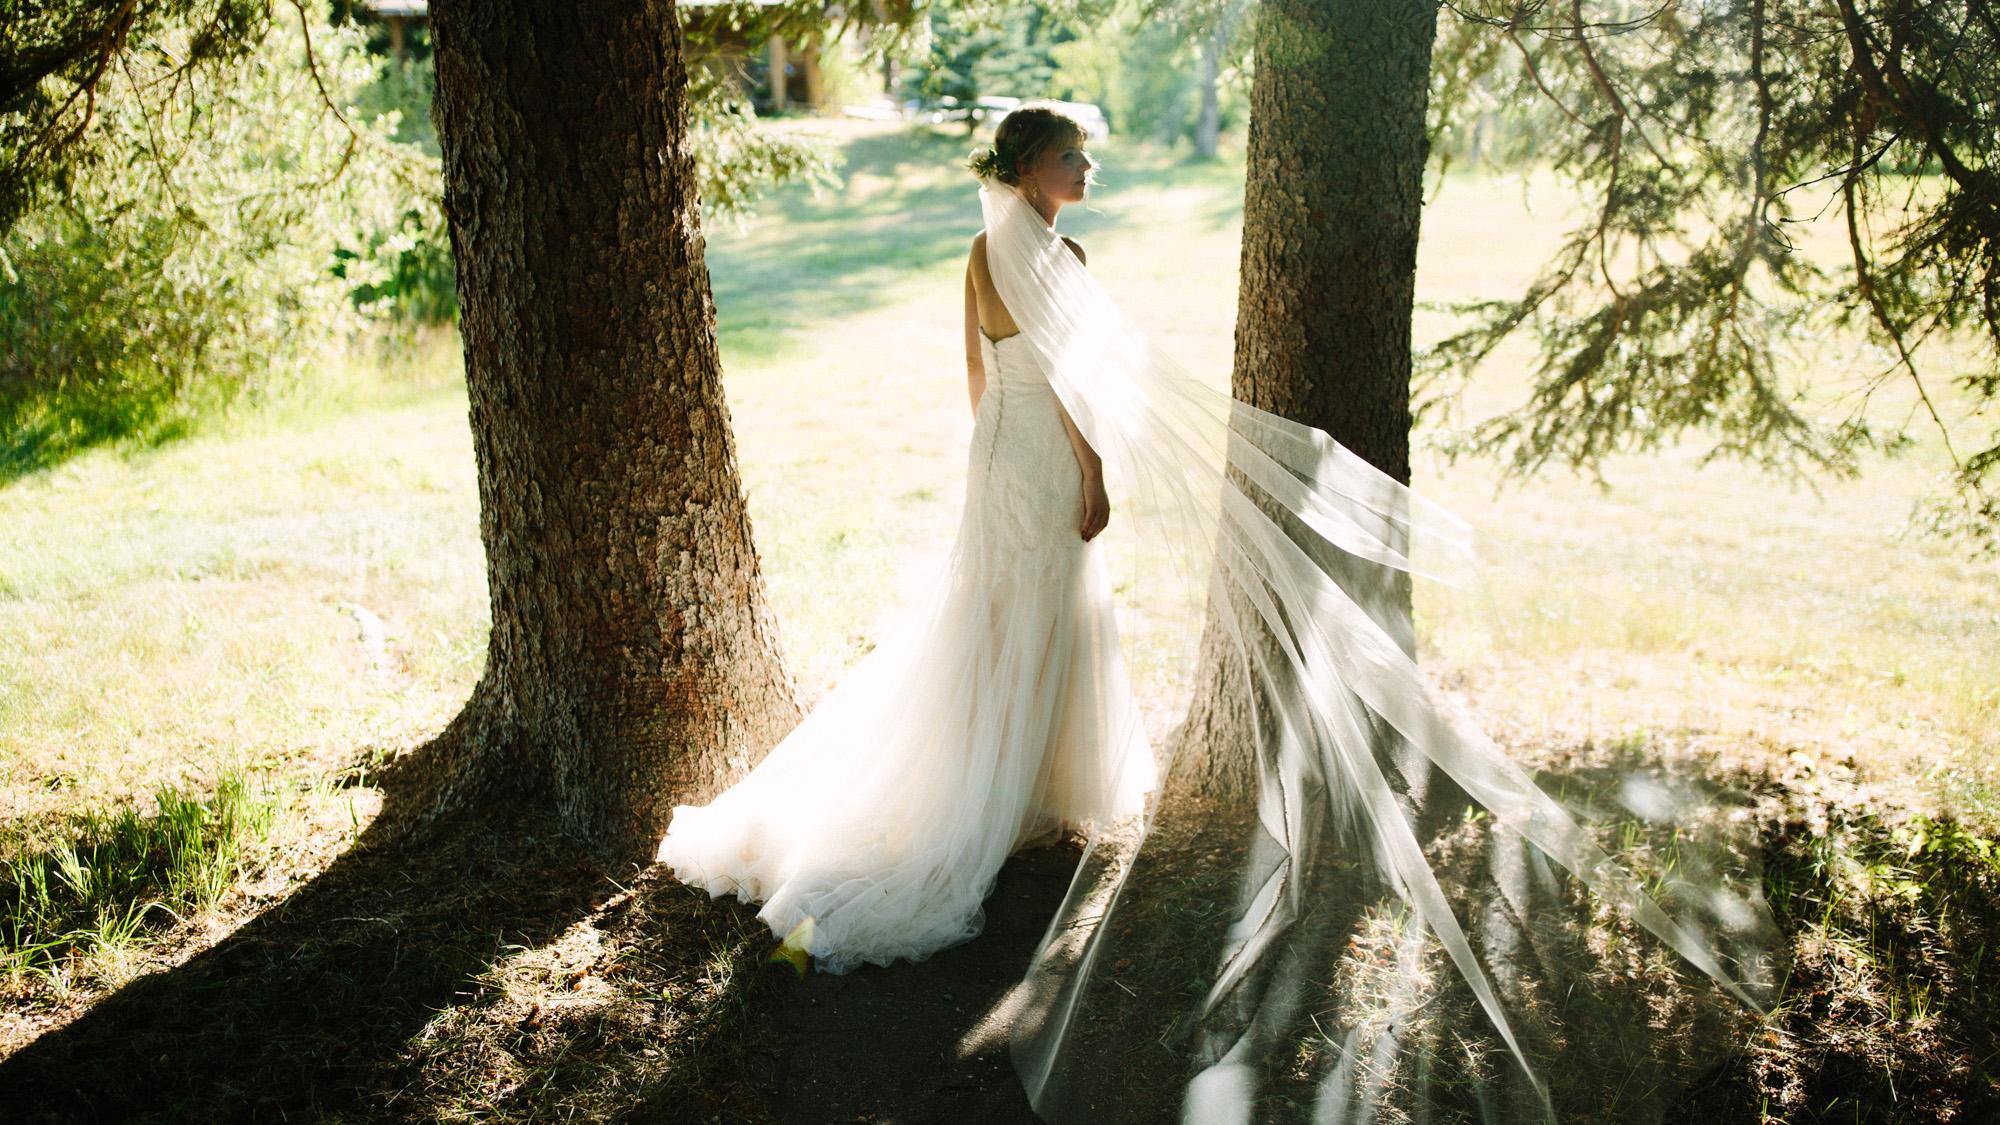 Montana_Wedding_Photos_alec_vanderboom-0114.jpg